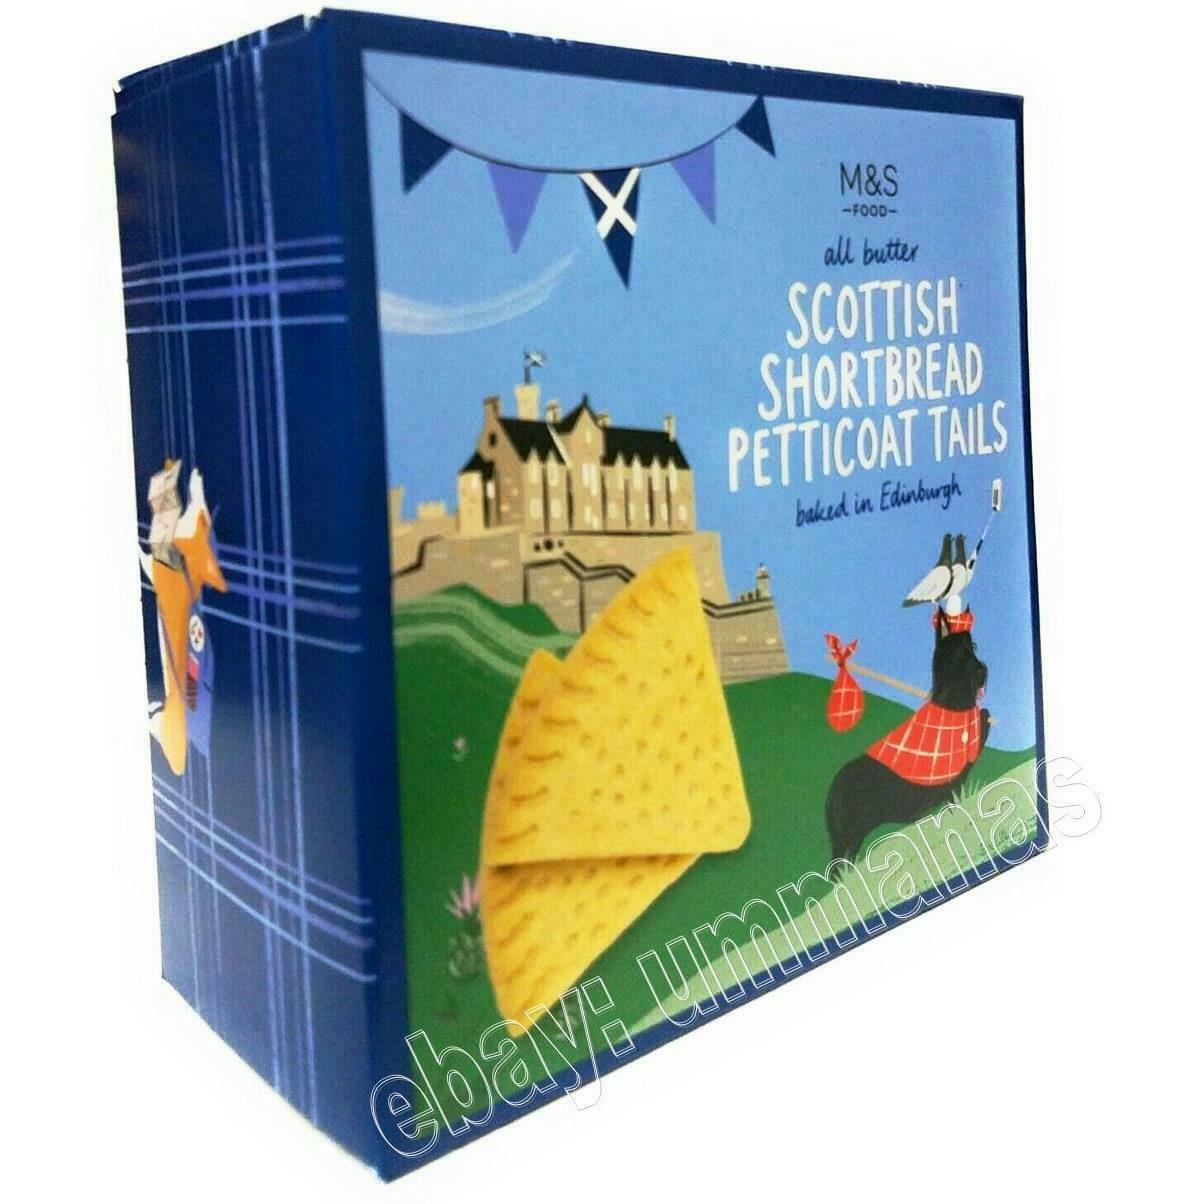 Marks & Spencer Scottish Shortbread Petticoat Tails (450g) £1.50 Instore @ M&S